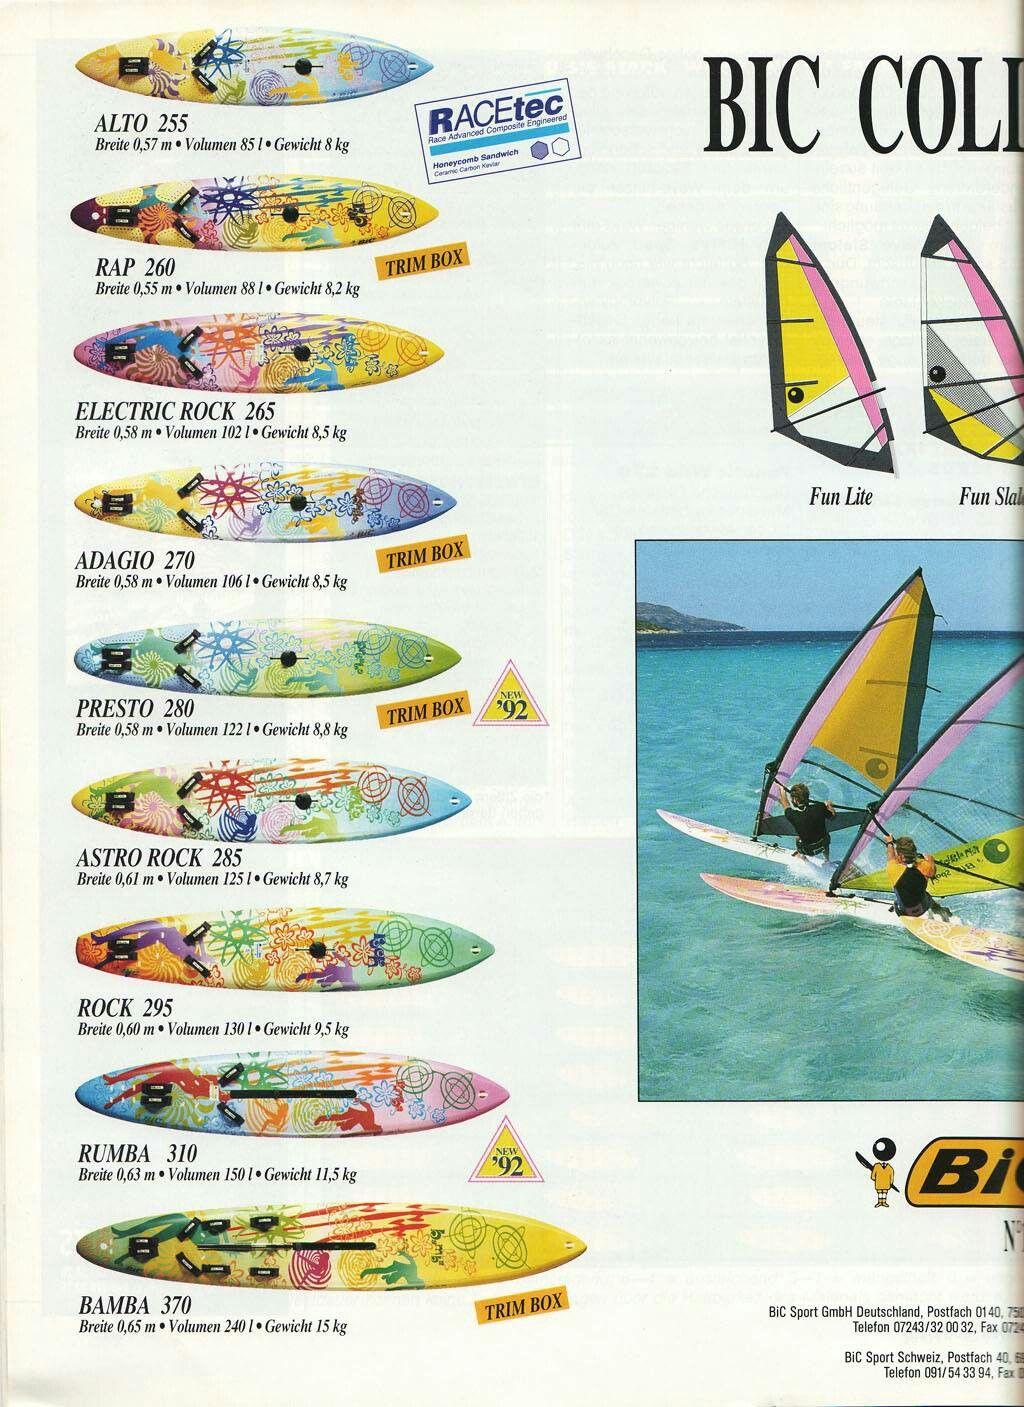 Windsurf Bic Collection Il Mio Astro Rock Planche A Voile Nautisme